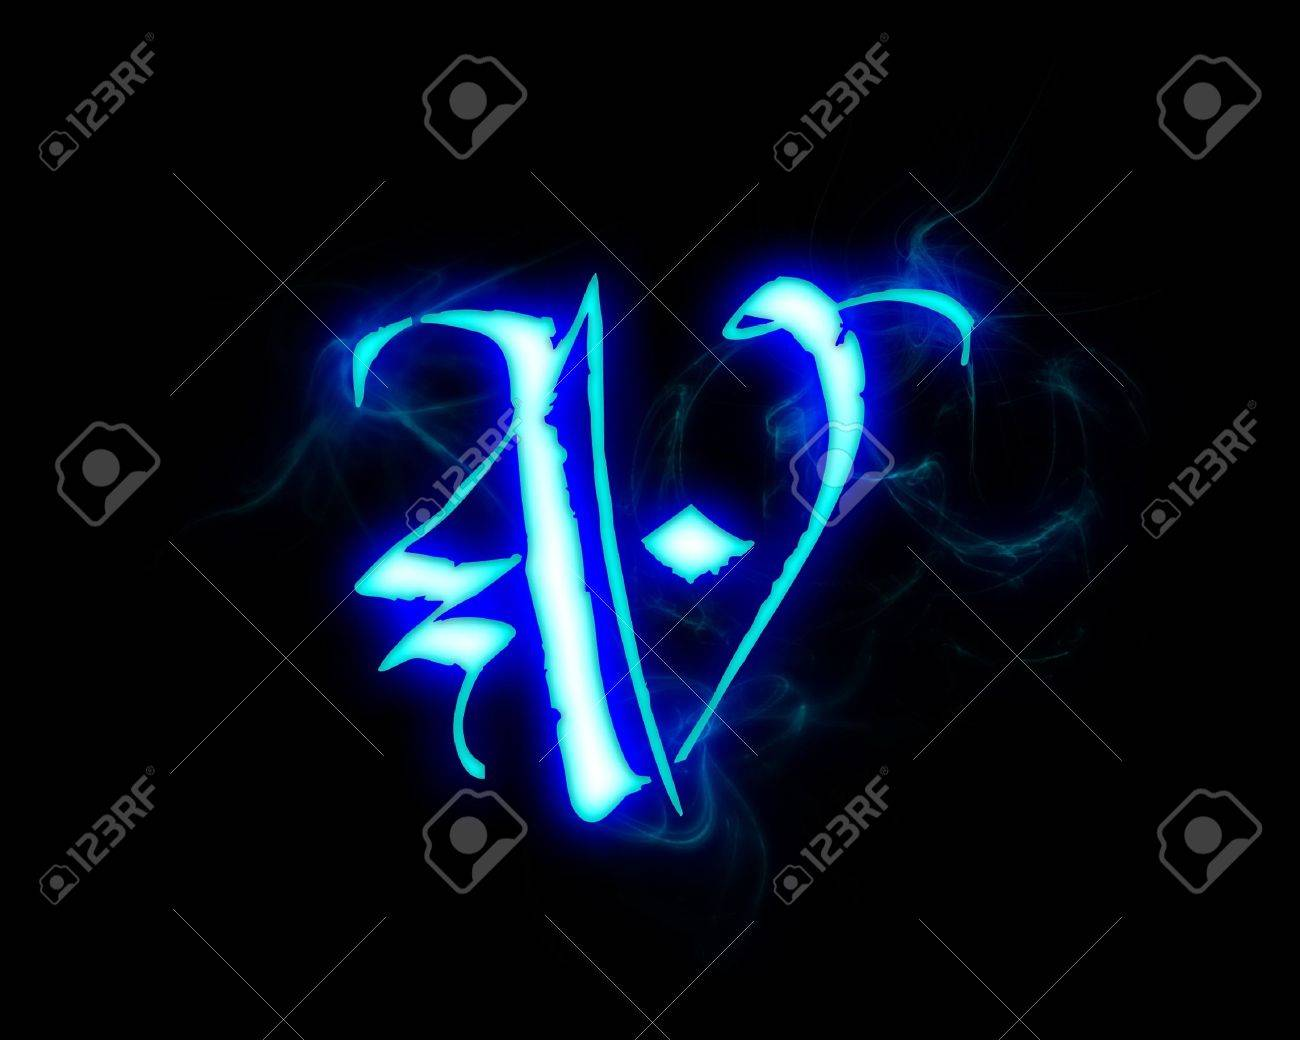 Blue Flame Magic Font Over Black Background Letter V Stock Photo